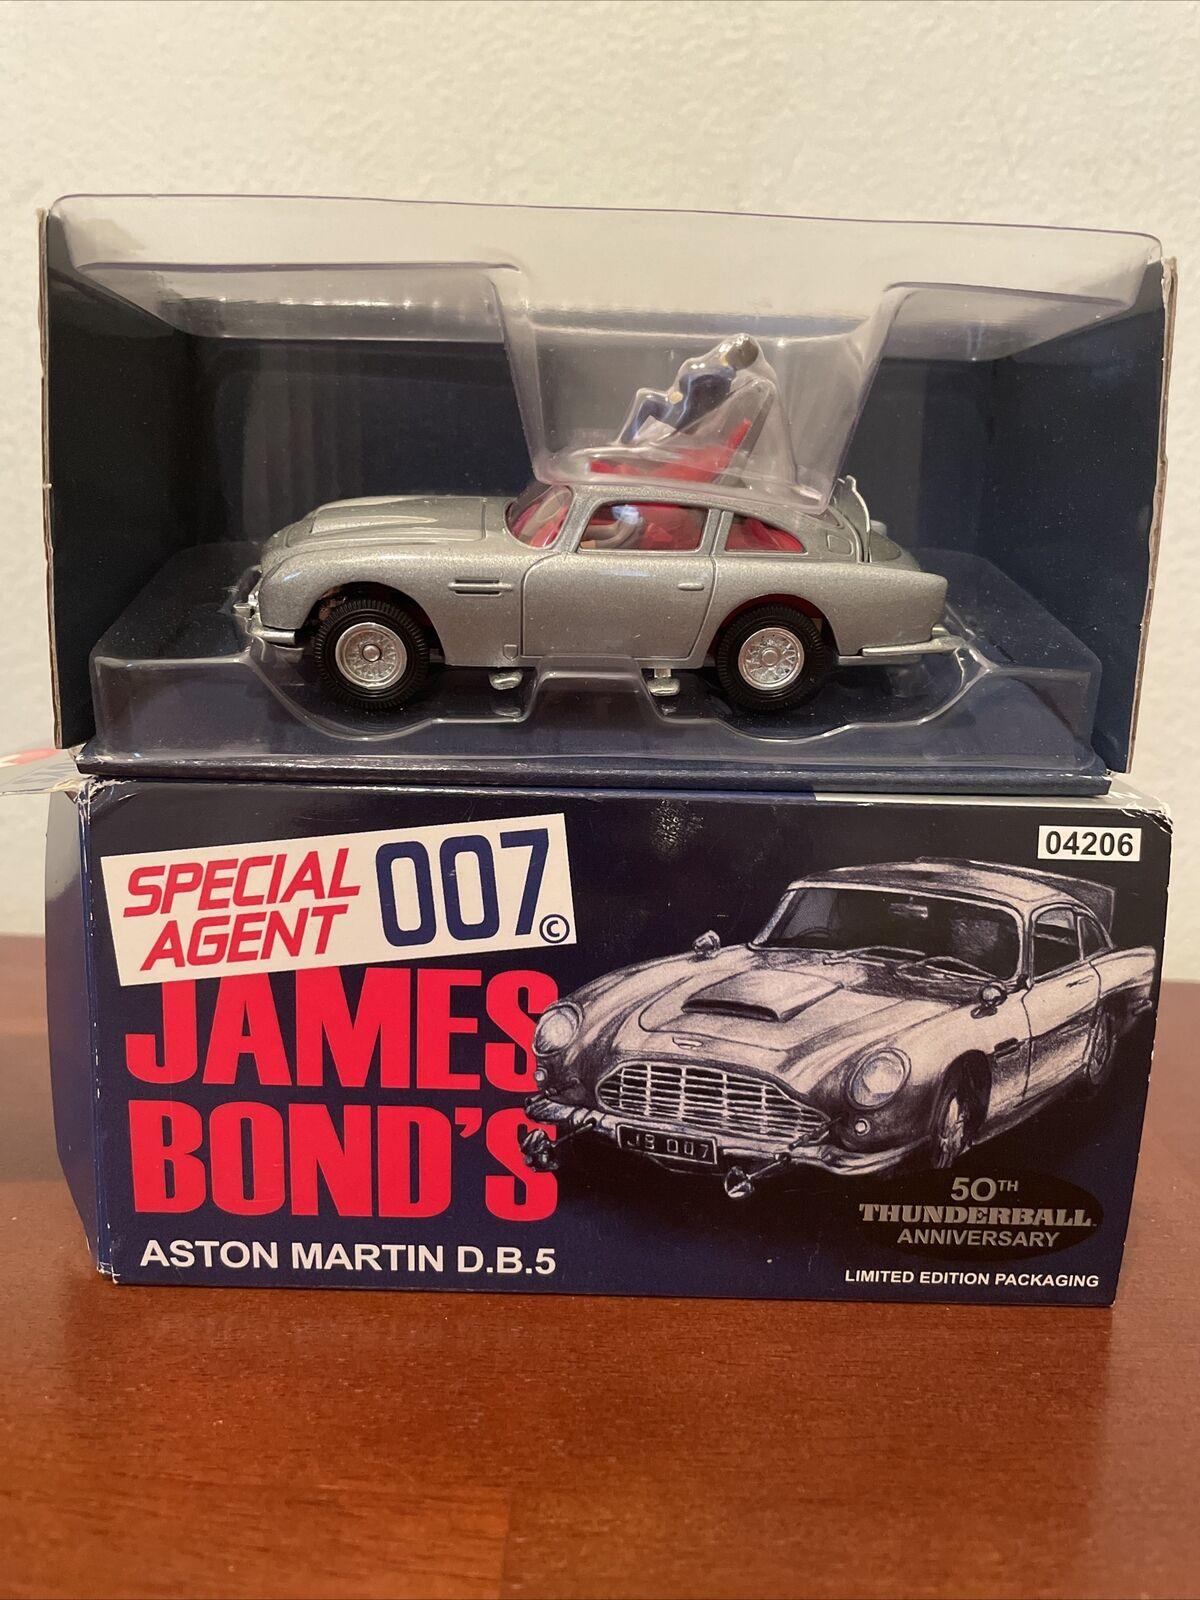 Corgi 04206 1 43 Scale James Bond Aston Martin Db5 Silver 50th Anniv Thunderball For Sale Online Ebay